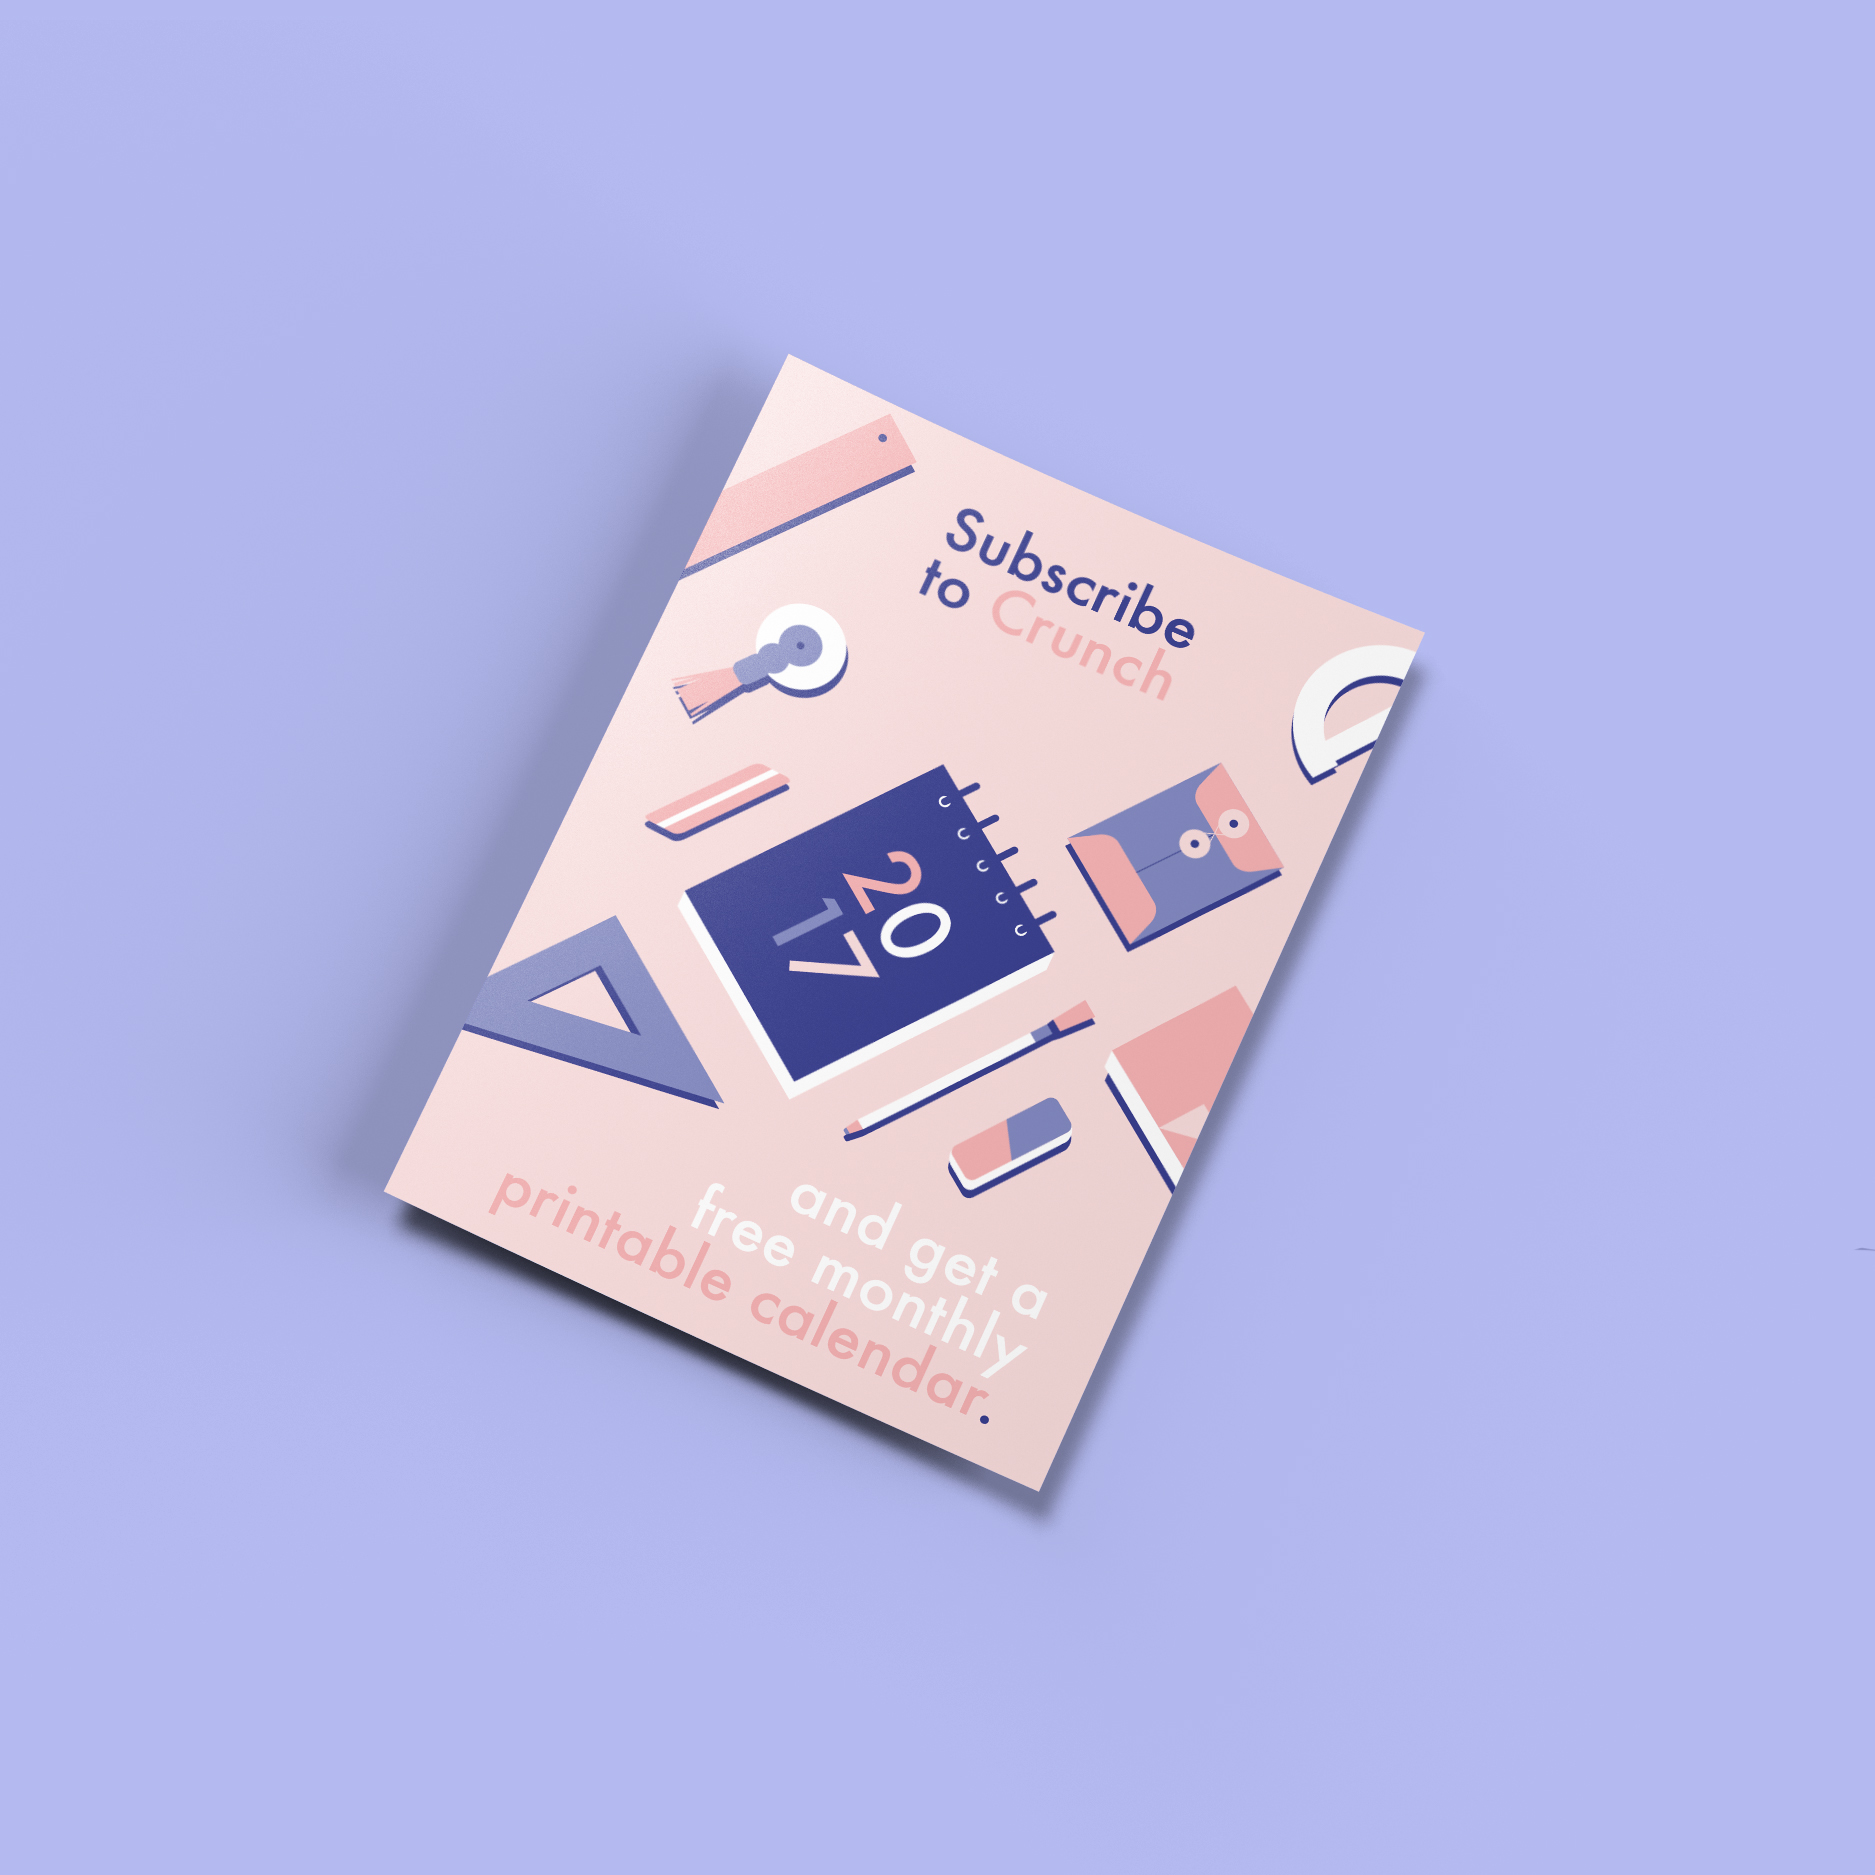 crunch_flyer